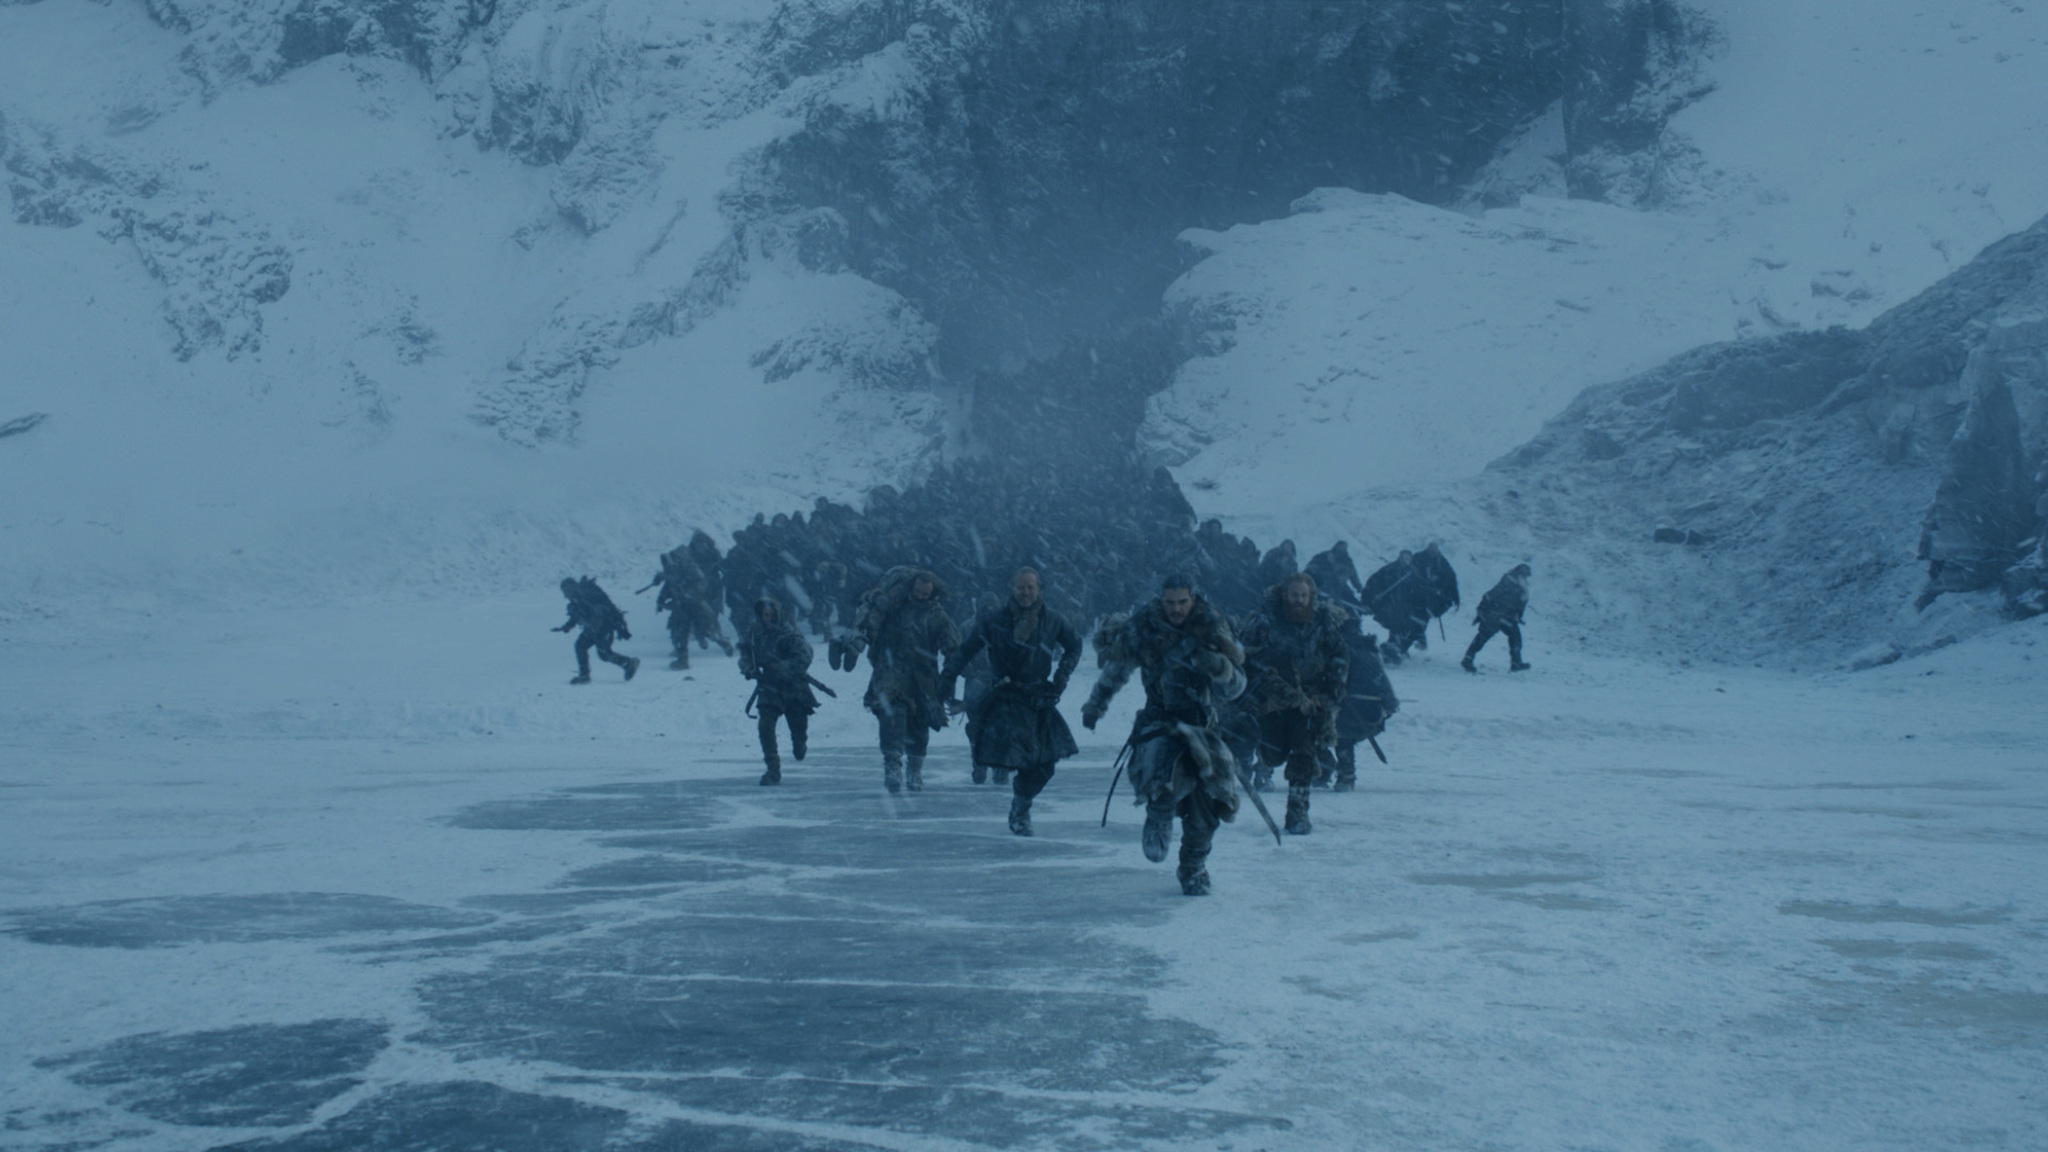 Iain Glen, Rory McCann, Kristofer Hivju, and Kit Harington in Game of Thrones (2011)